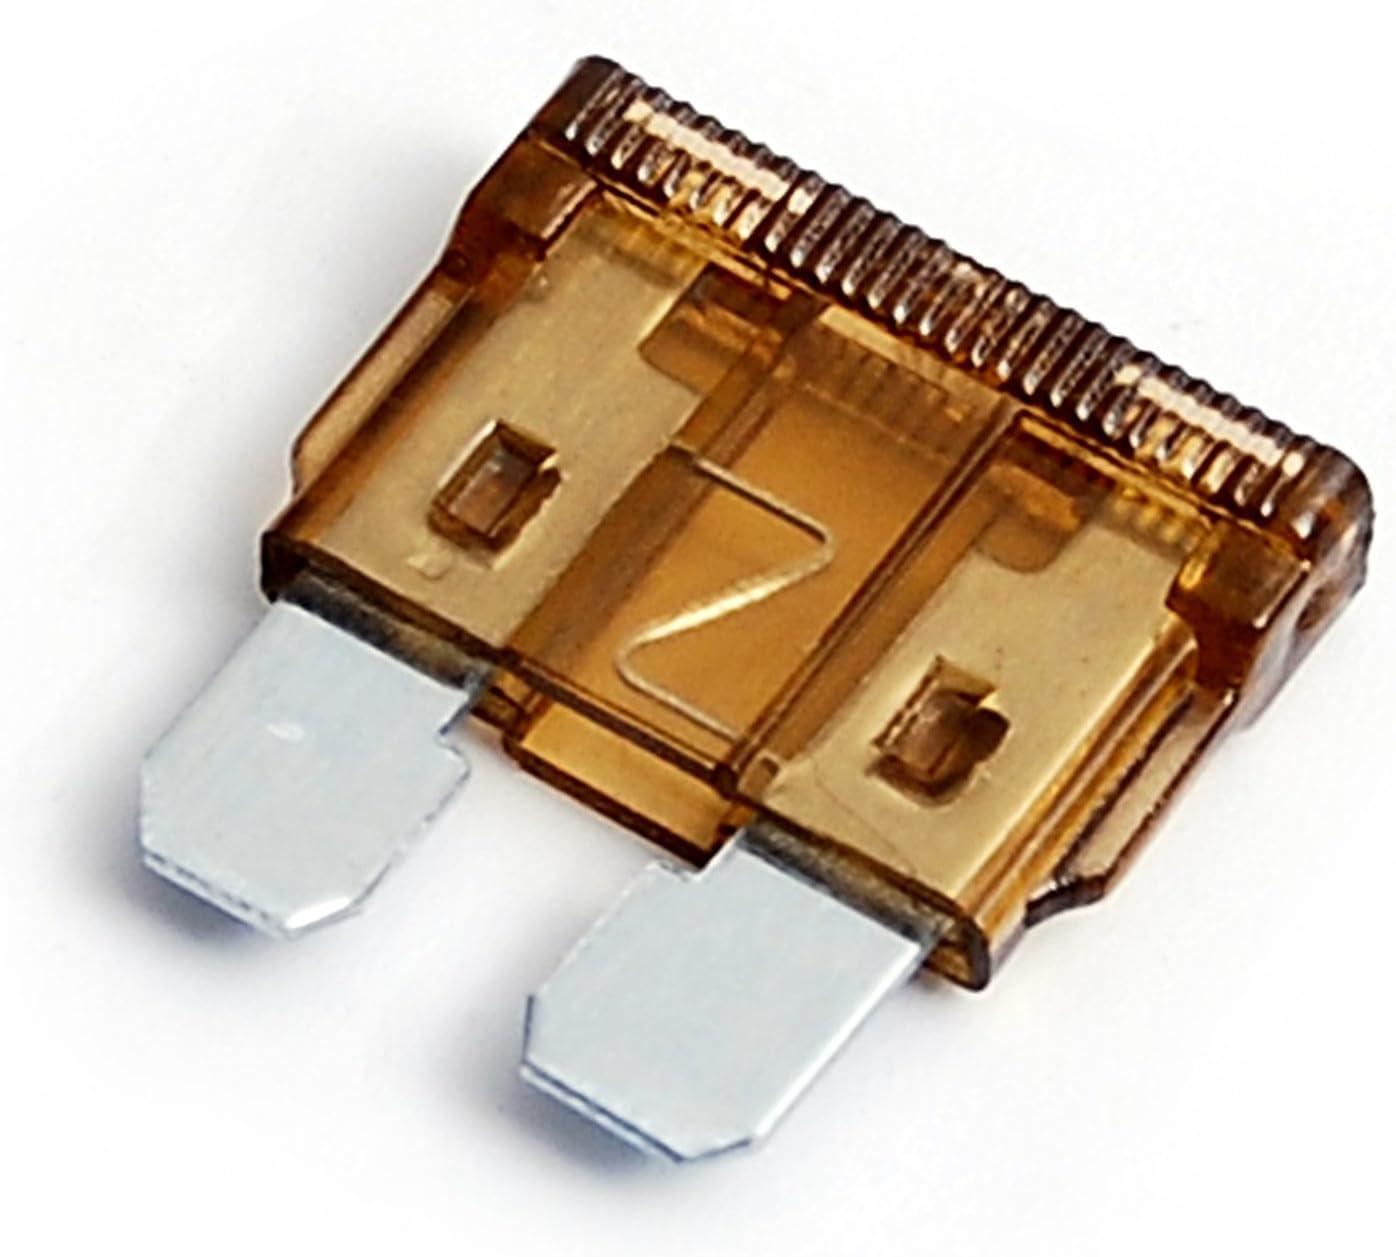 5 Amp Conext Link ATC5-25 ATC Fuse 25 Pack